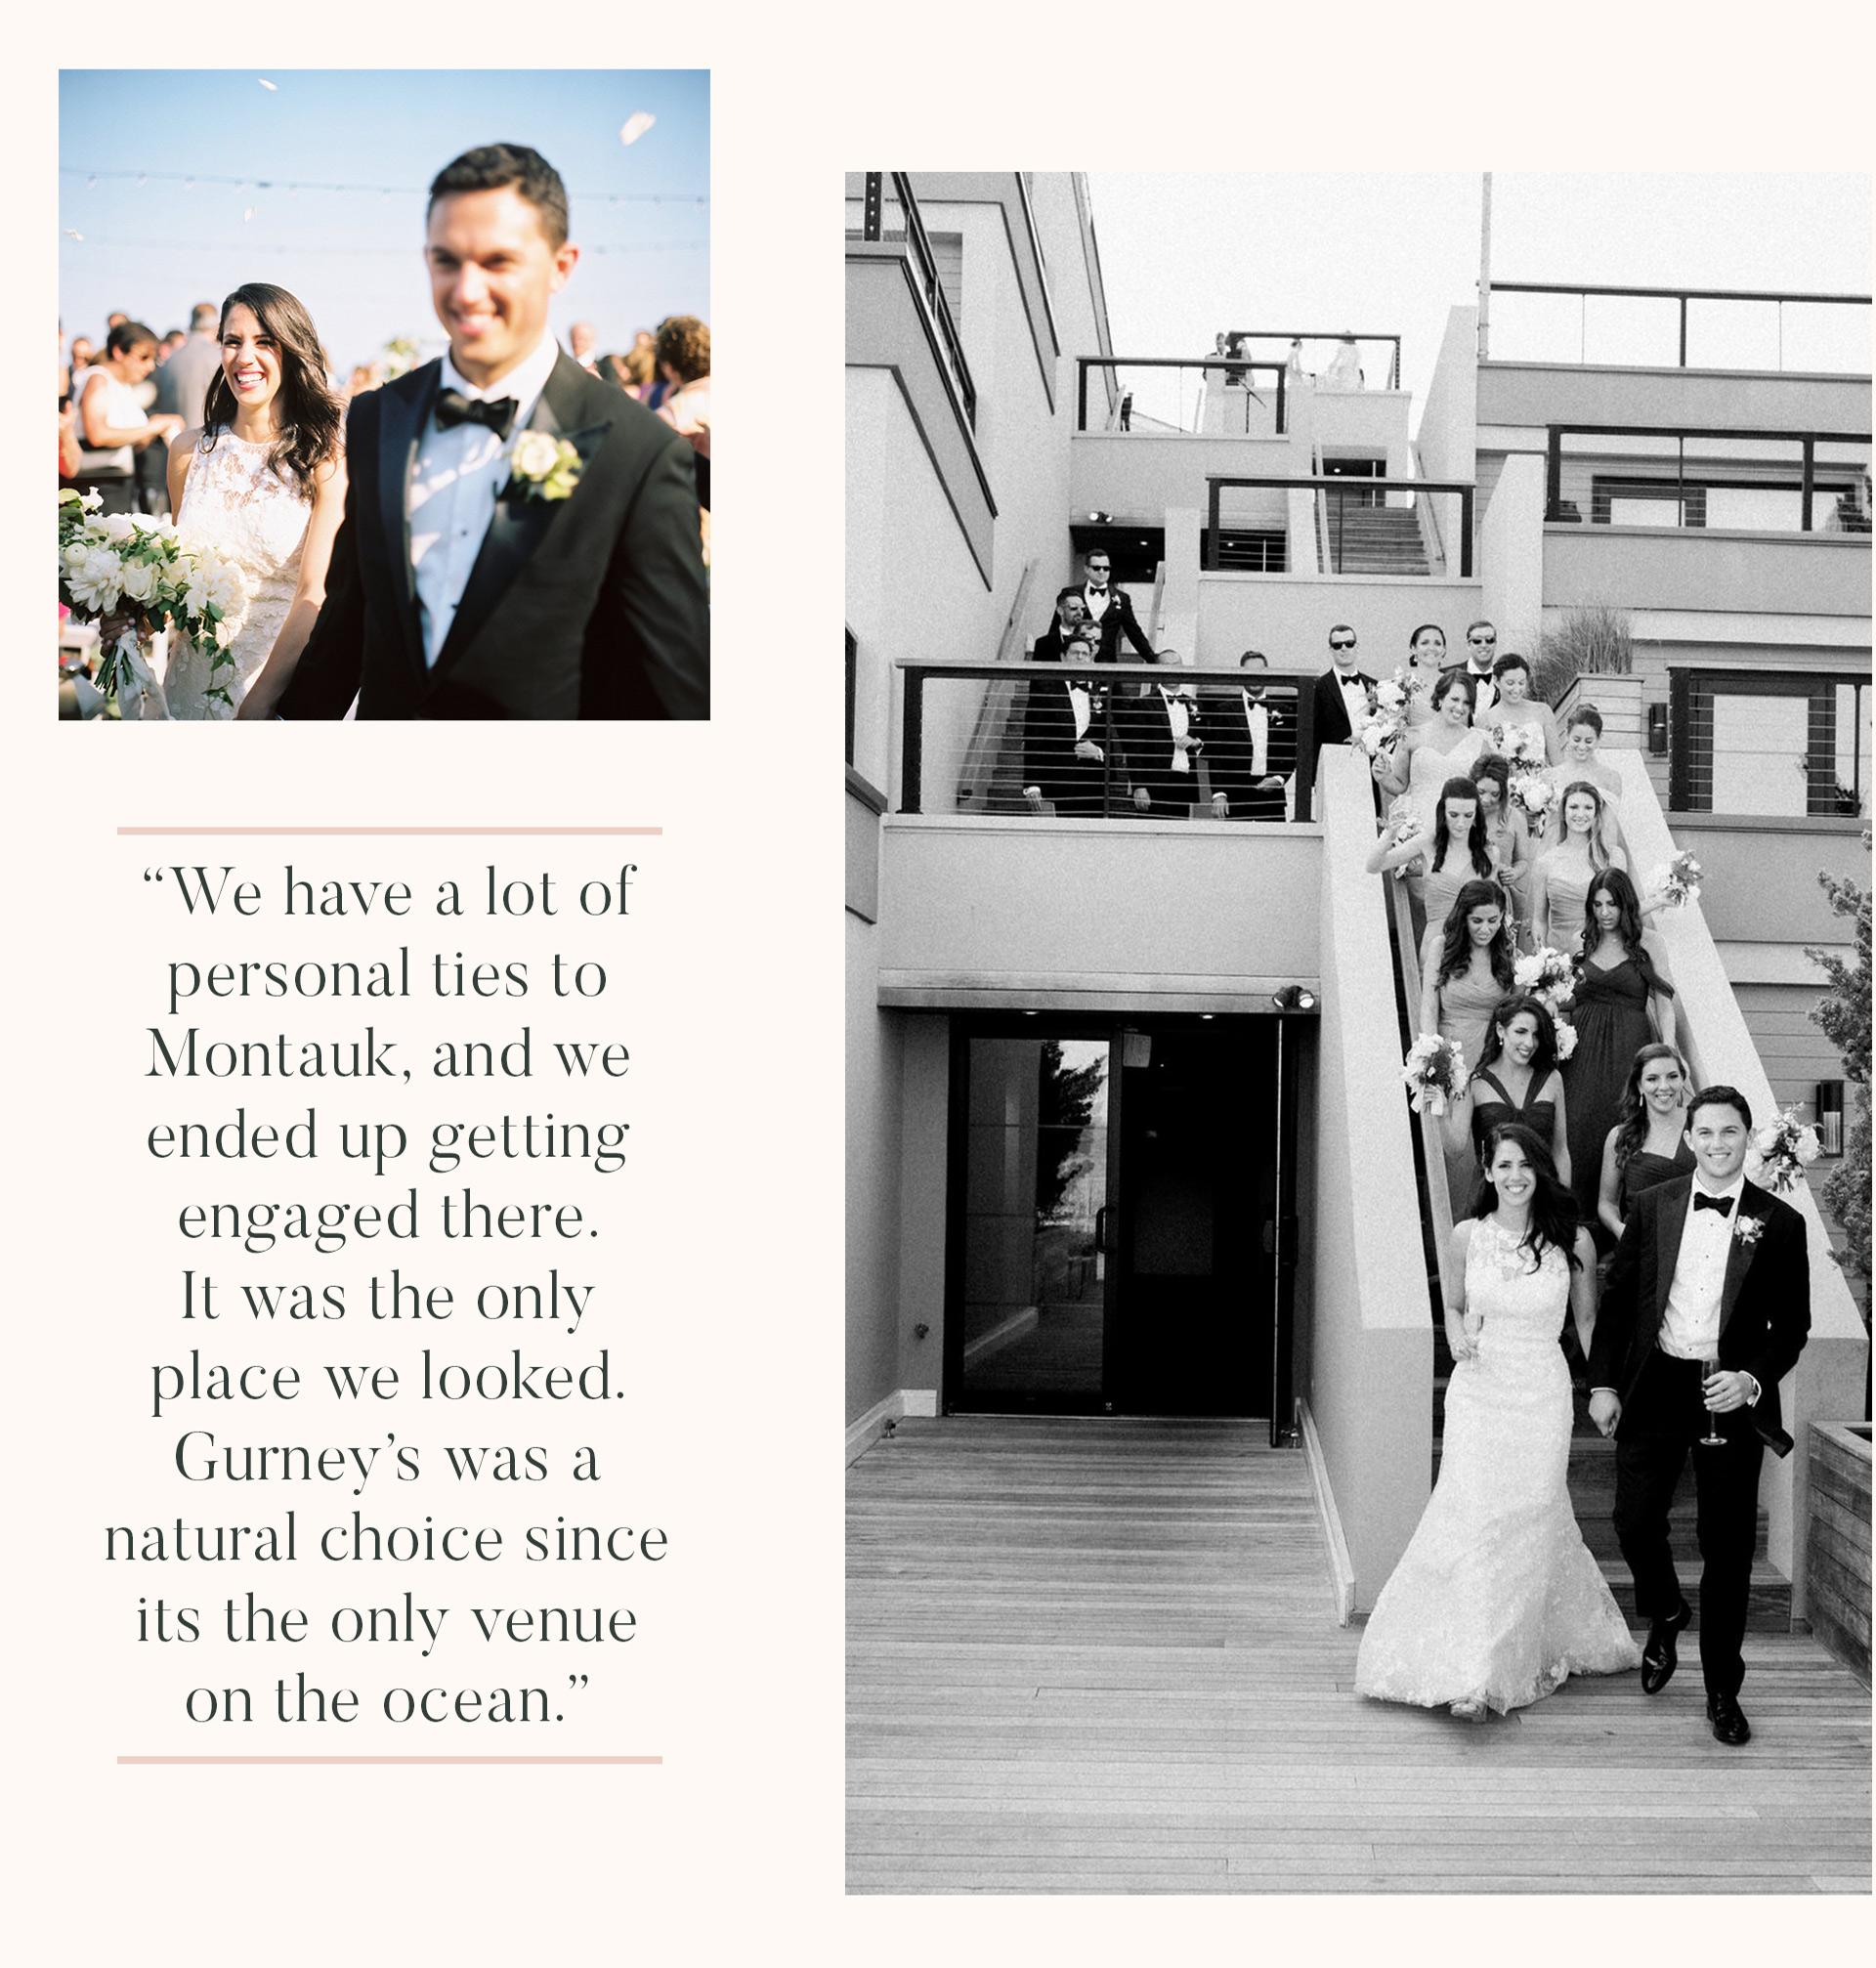 14 gurneys montauk wedding photographer - GURNEYS WEDDING - MONTAUK, NY